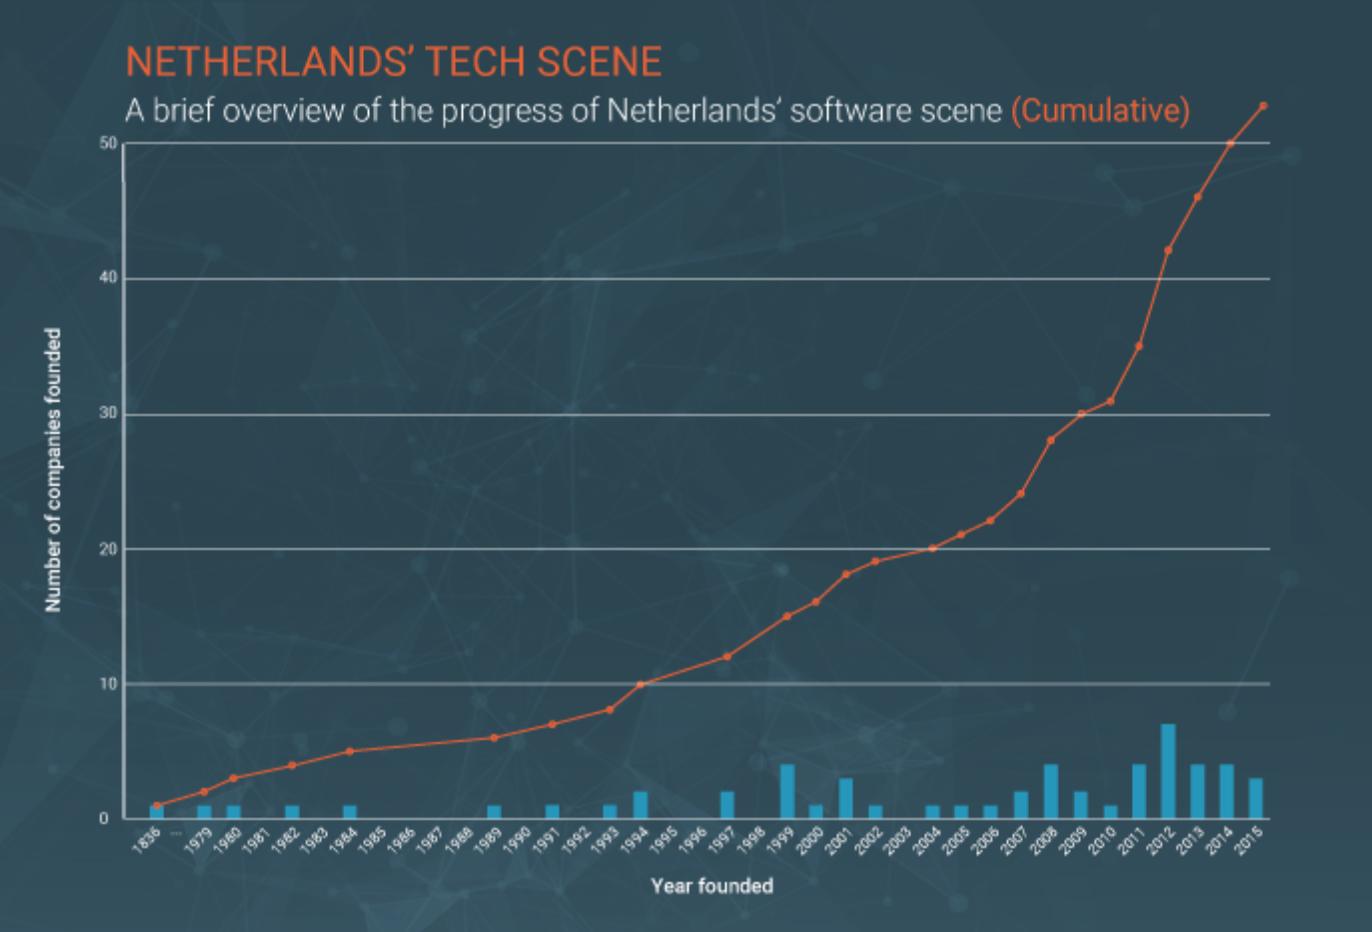 Netherlands tech scene